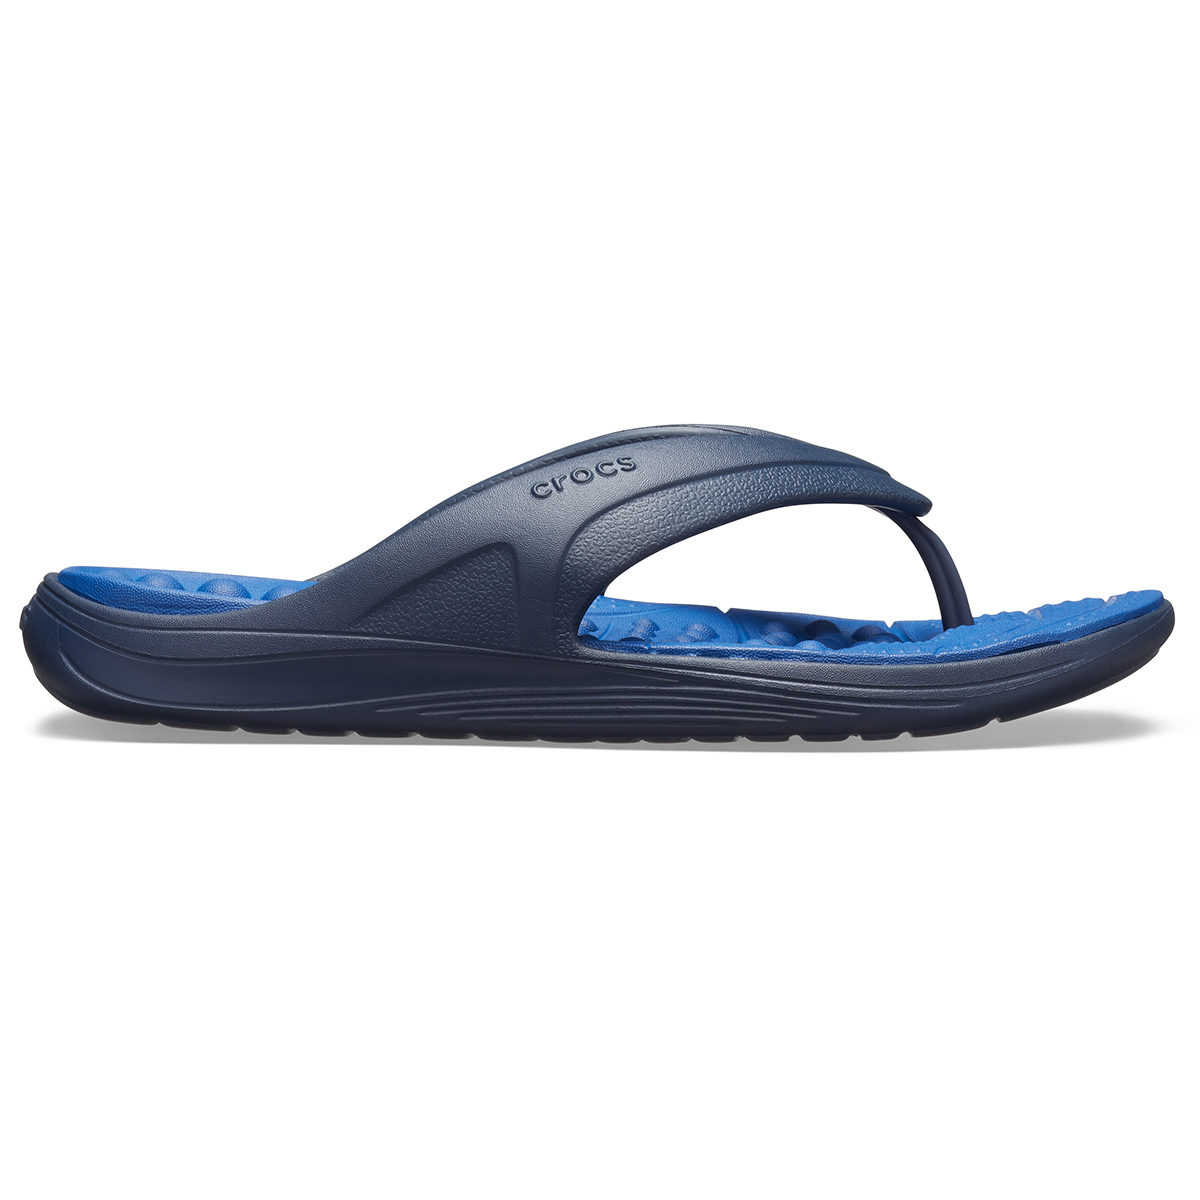 Crocs Reviva Flip - Lacivert/Mavi Jean